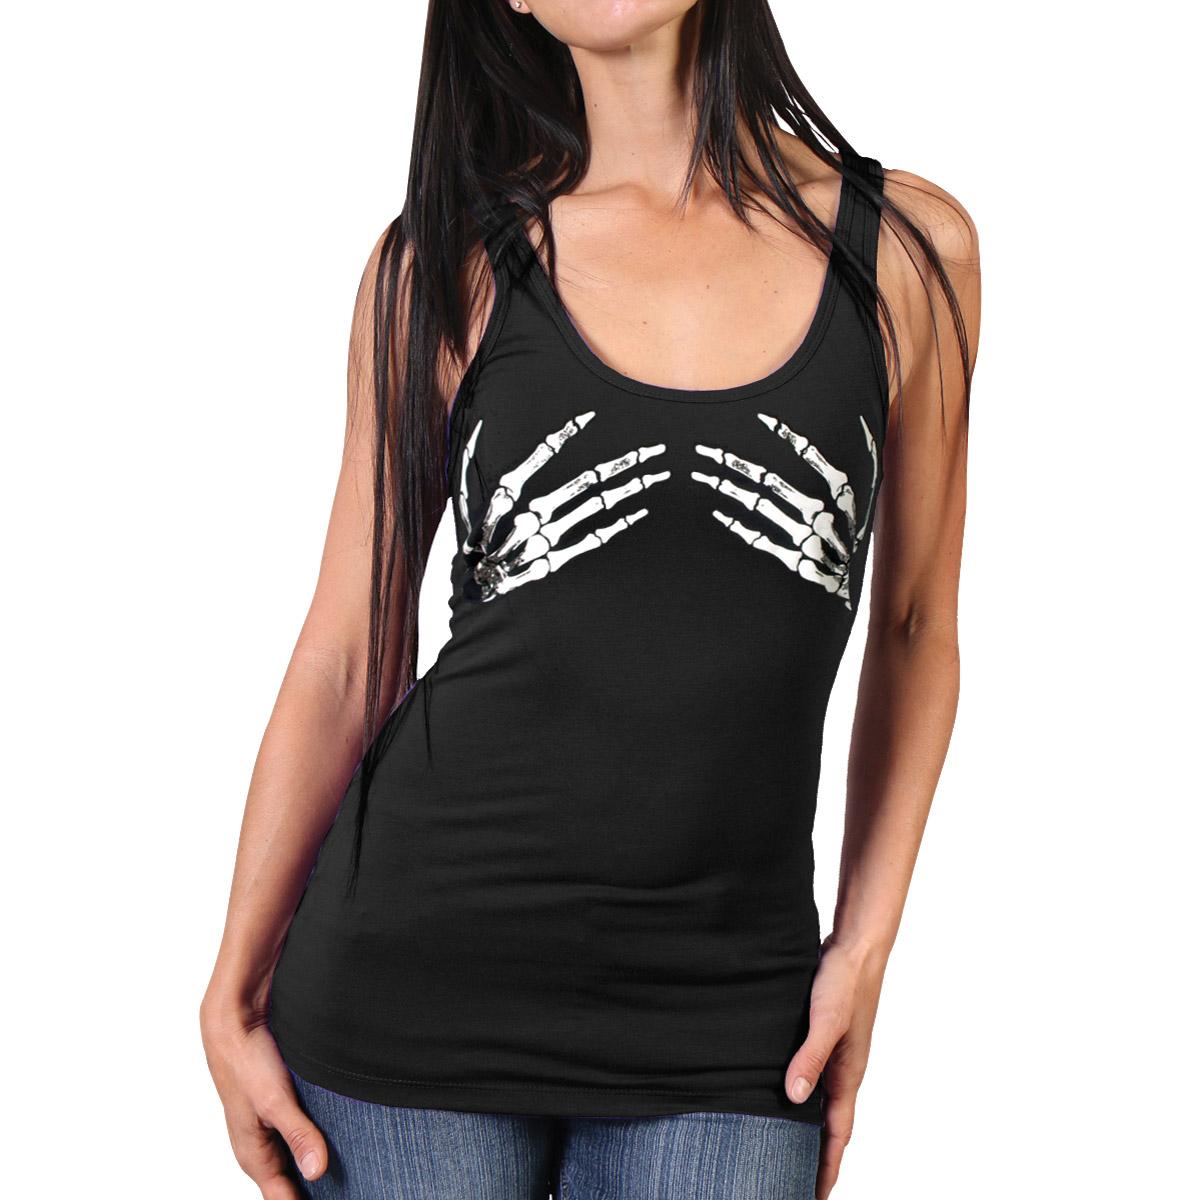 Hot Leathers Women's Skeleton Hands Black Tank Top